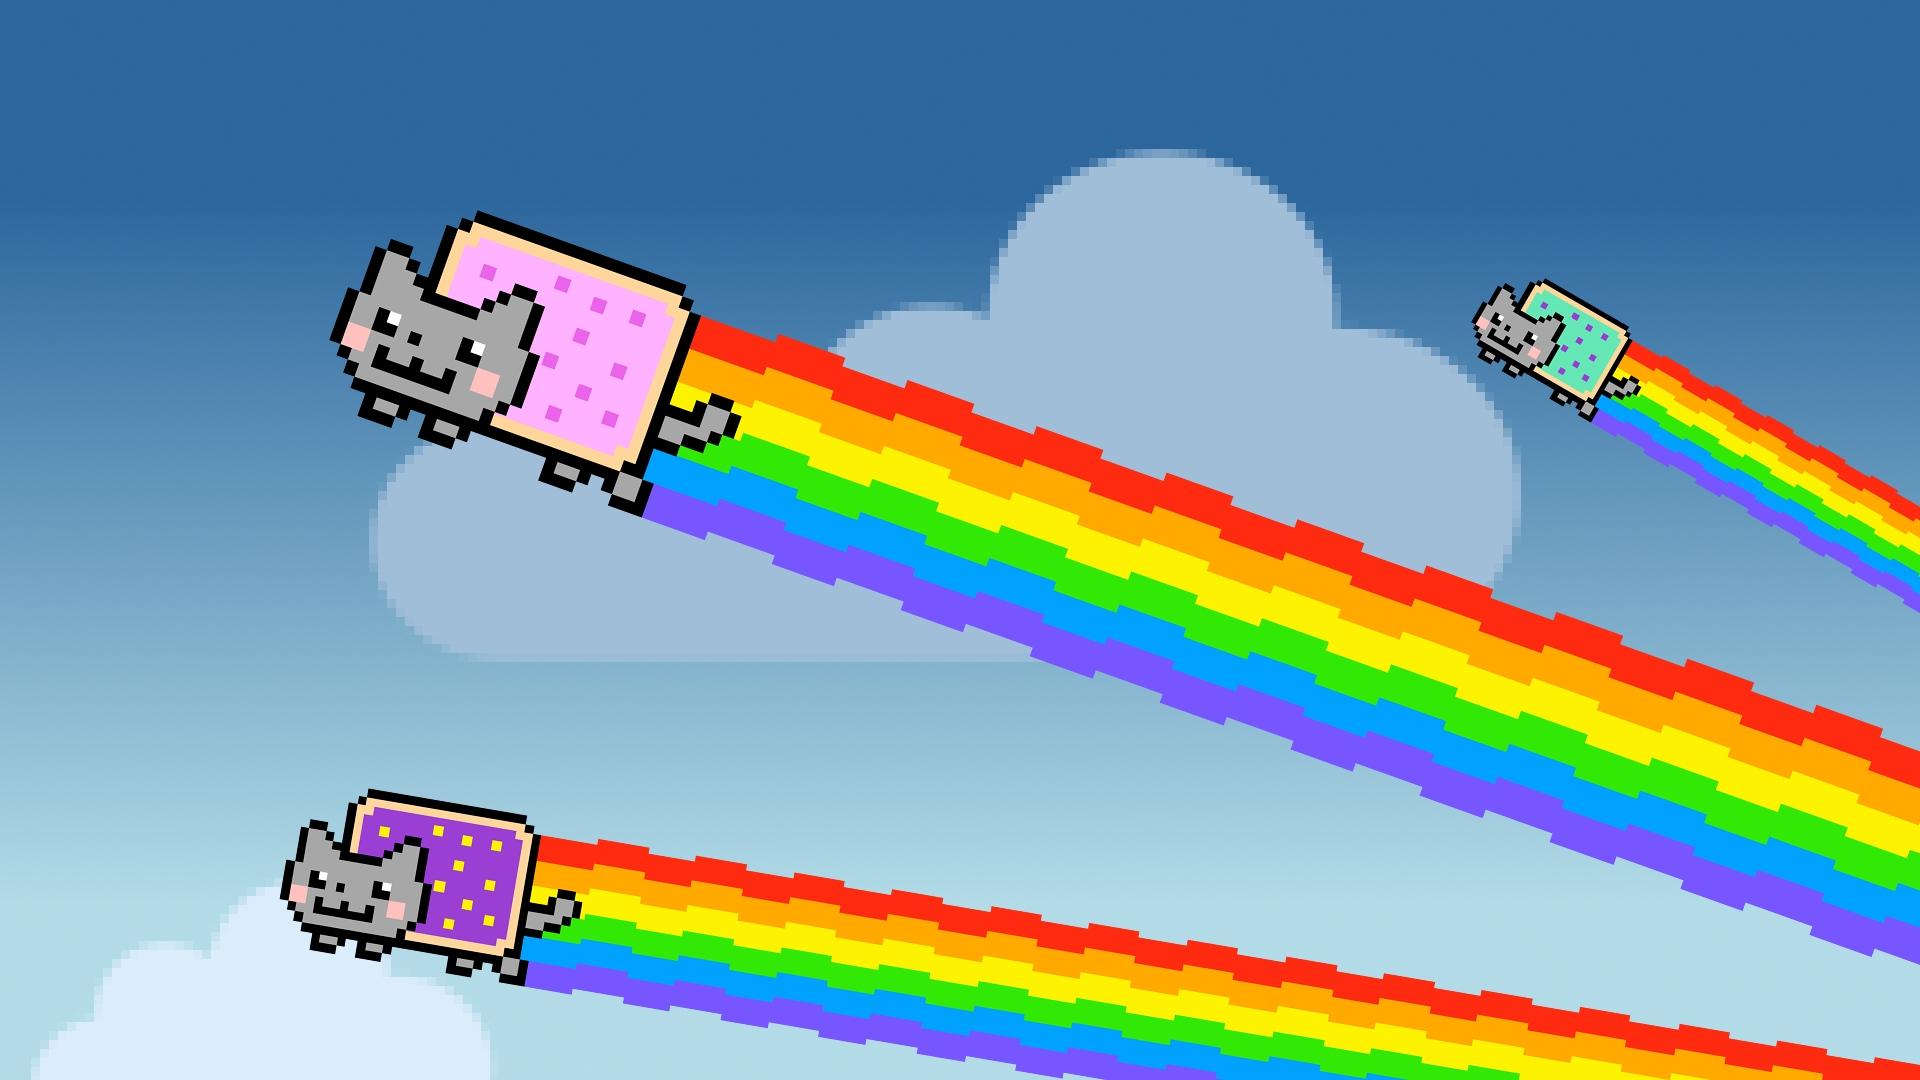 Nyan Cats Are Go By Jayro Jones On Deviantart